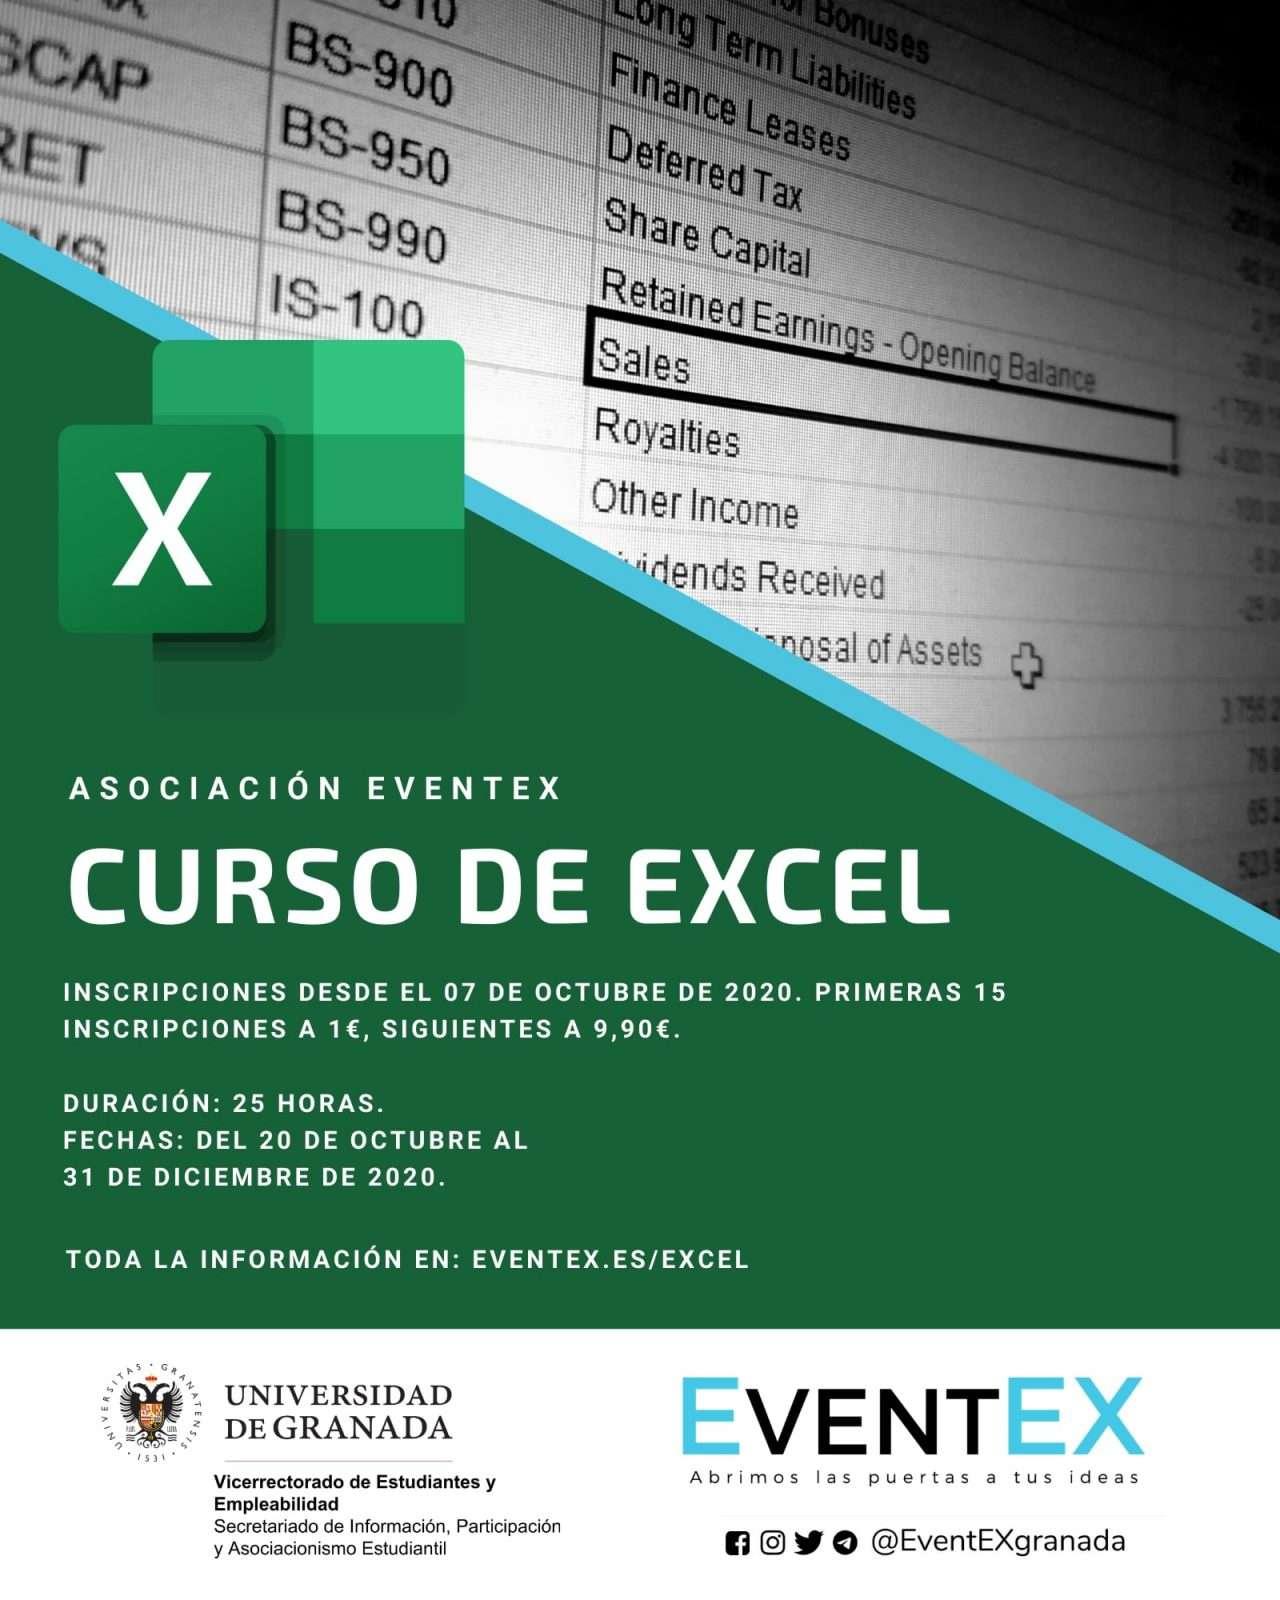 Curso de Excel - Asociación EventEX